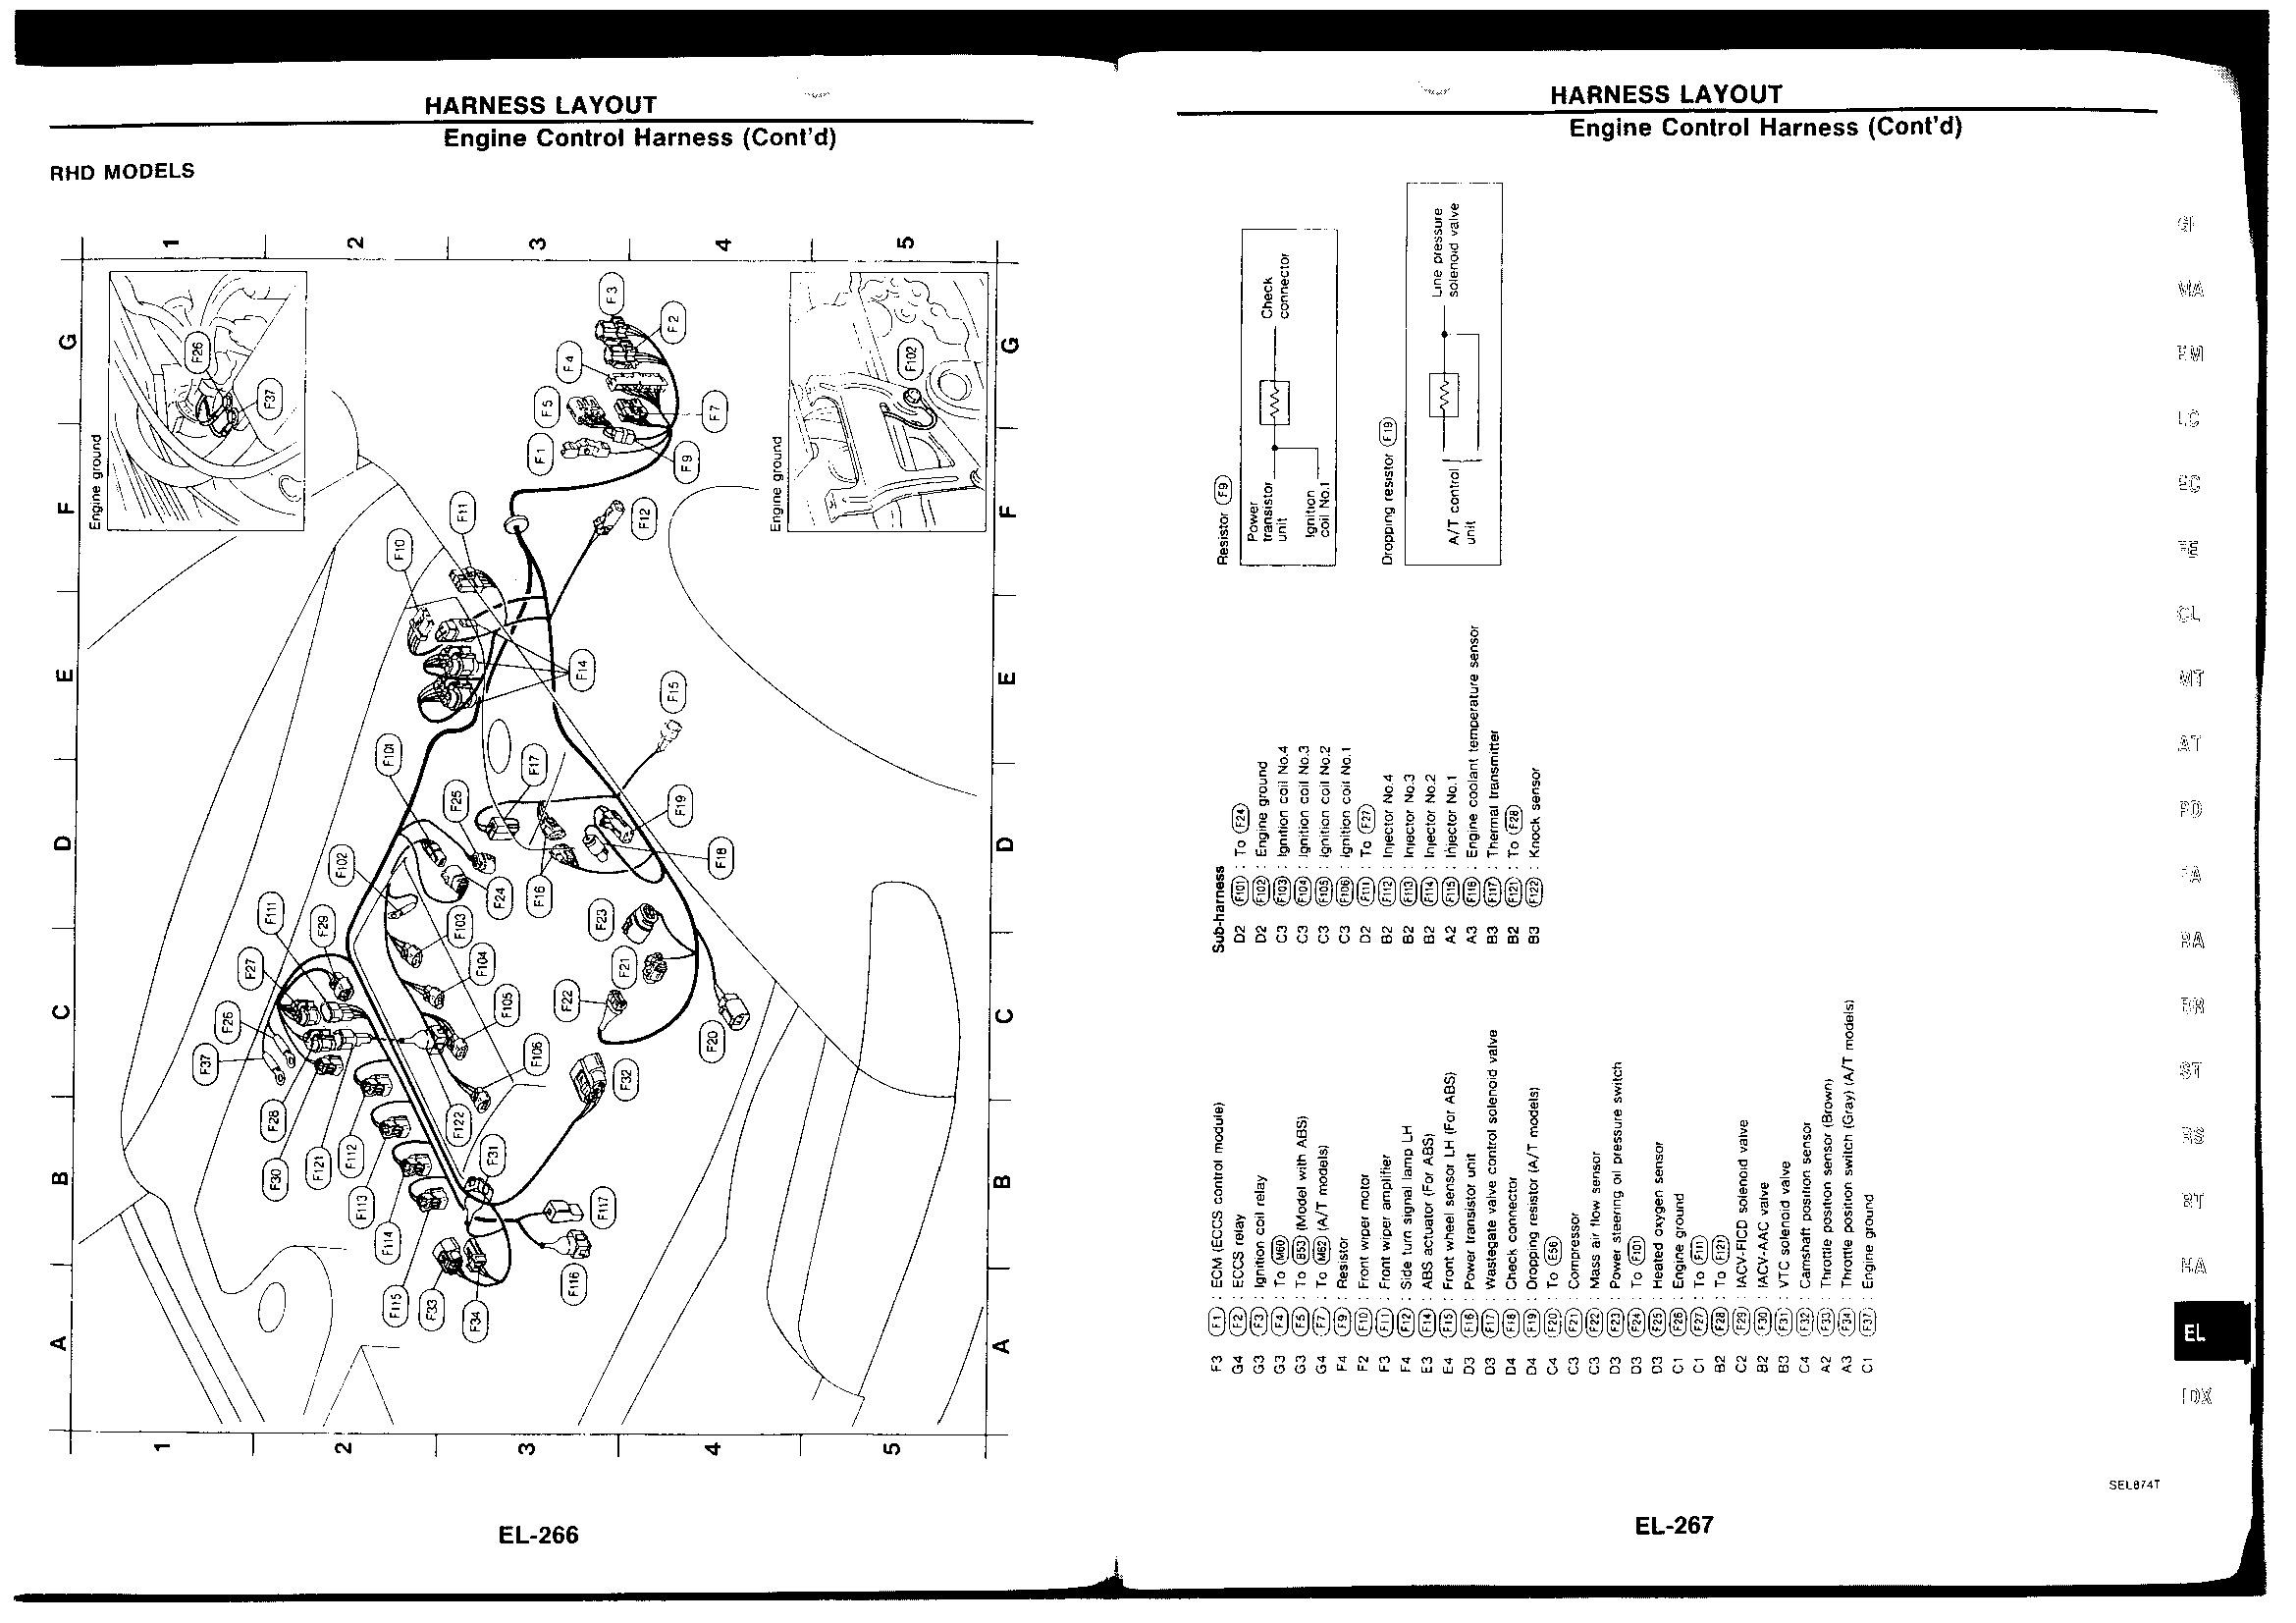 s14_zenki_sr20det_english_text_page_802?w\\\=820\\\&h\\\=580 s14 radio wiring diagram 60 series ecm pins diagram \u2022 edmiracle co  at bakdesigns.co